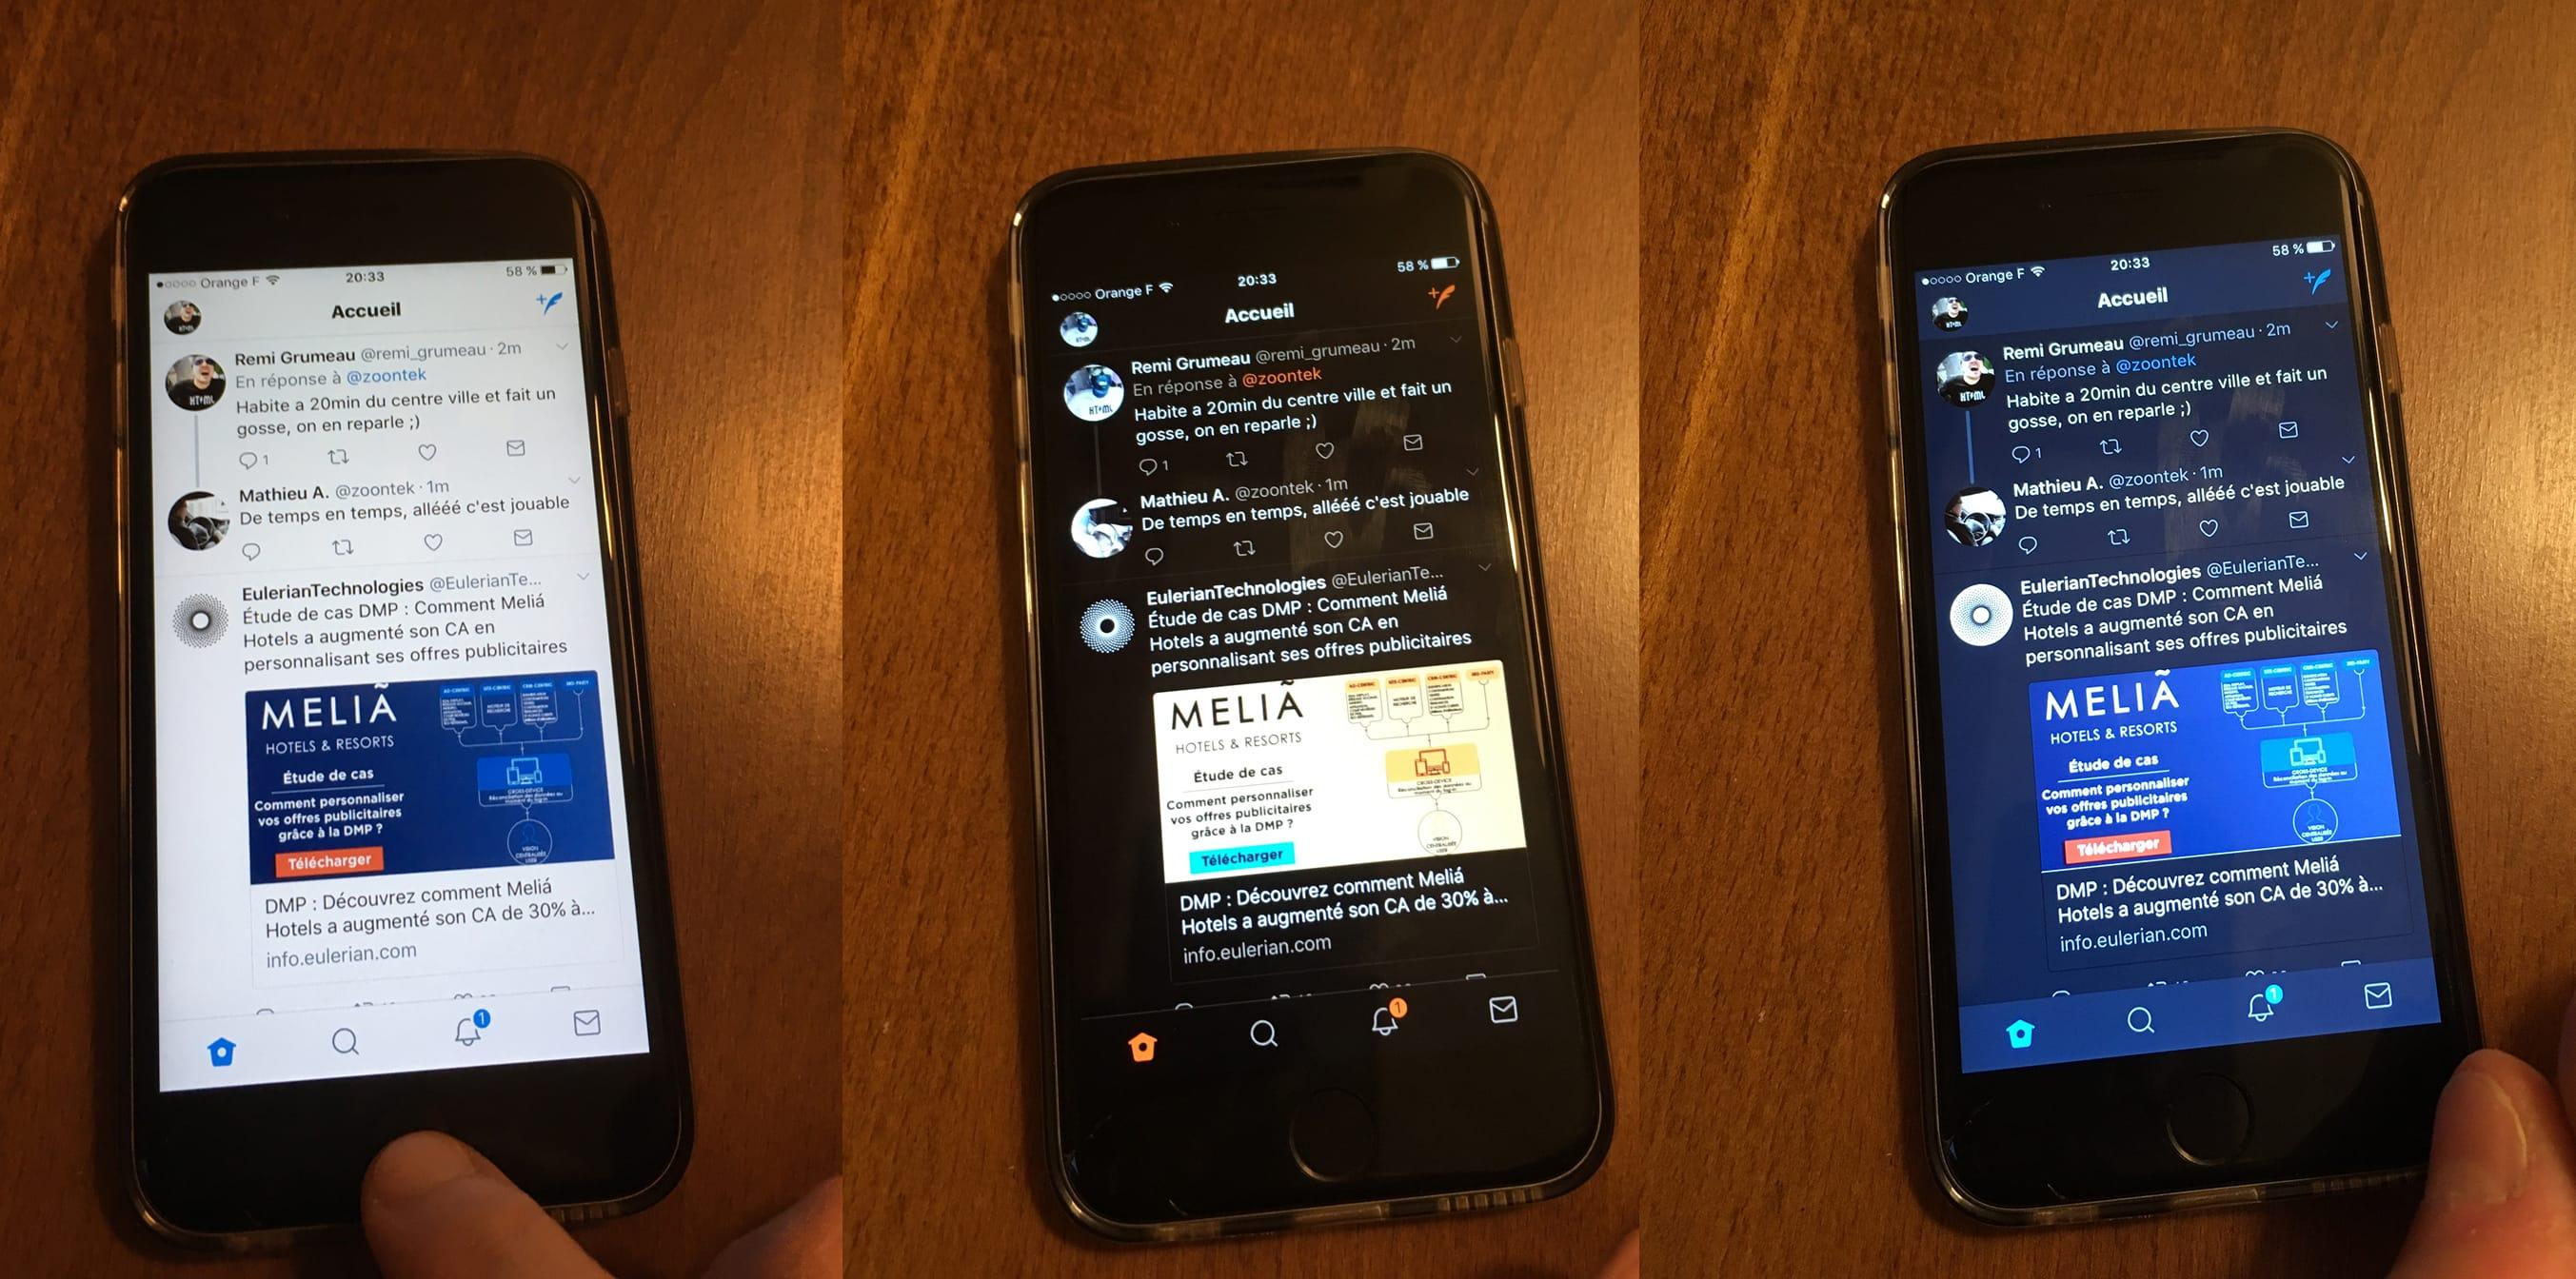 Apple iOS Twitter en mode inversé